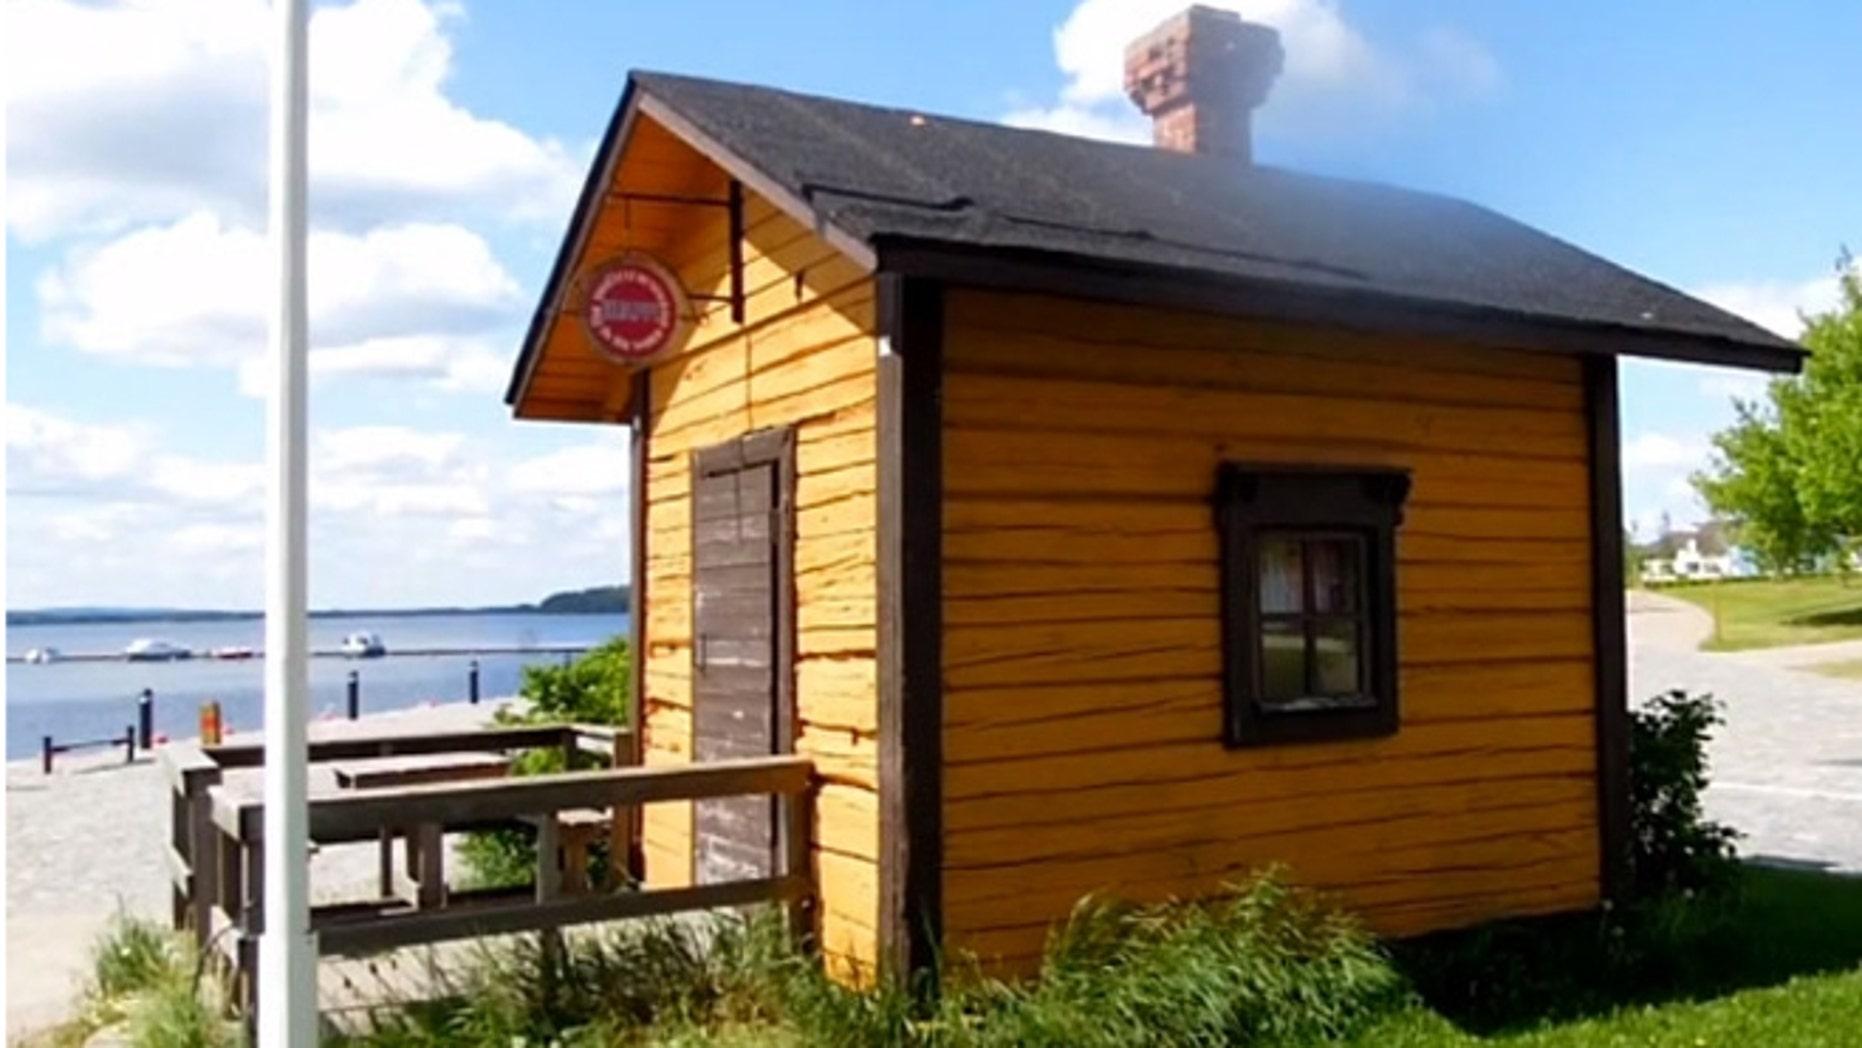 Kuappi, Iisalmi, Finland